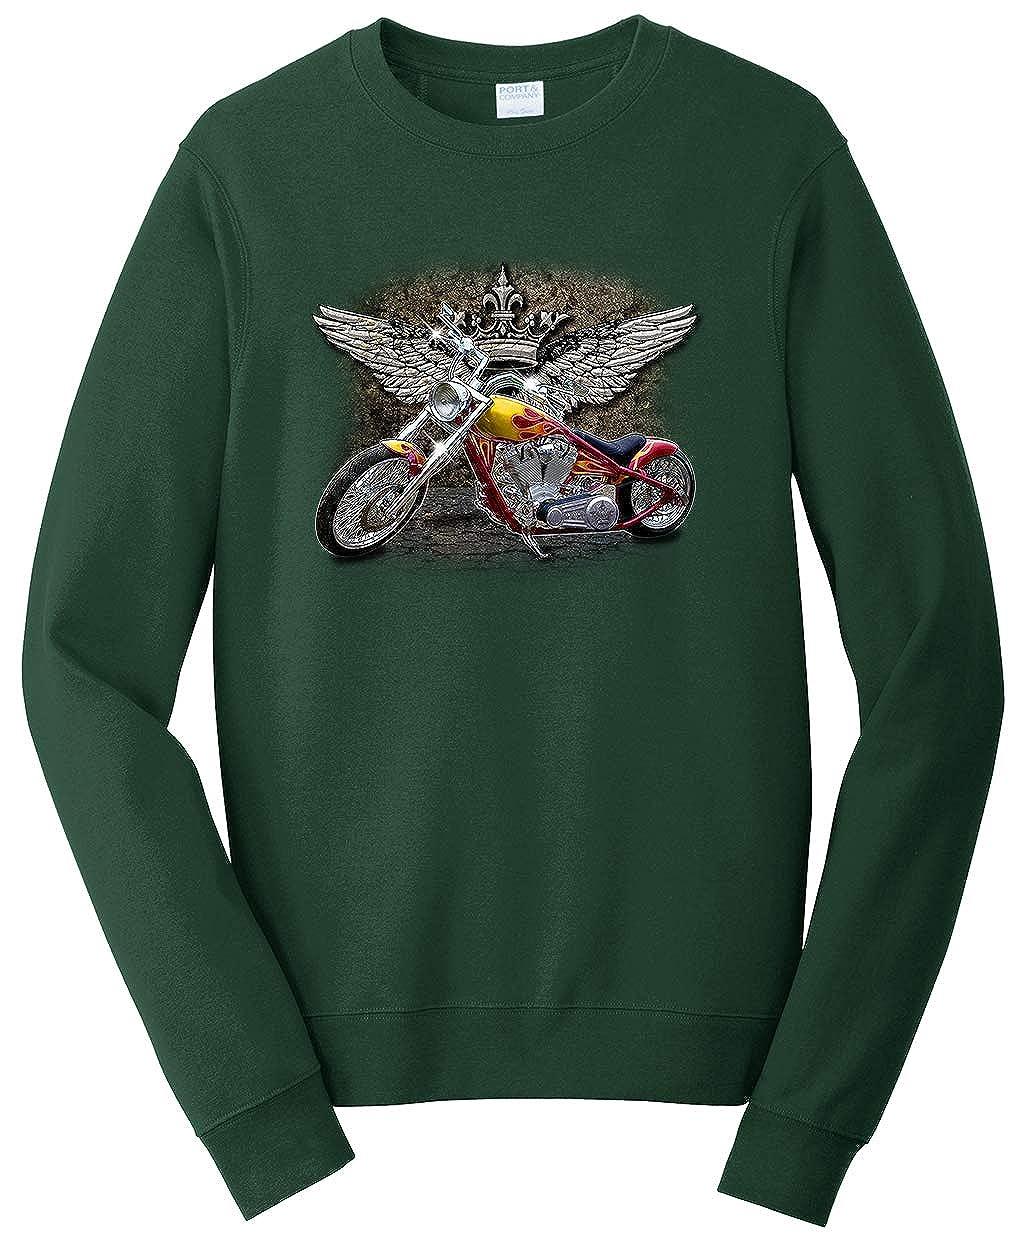 Tenacitee Unisex Crown Glory Chopper Sweatshirt